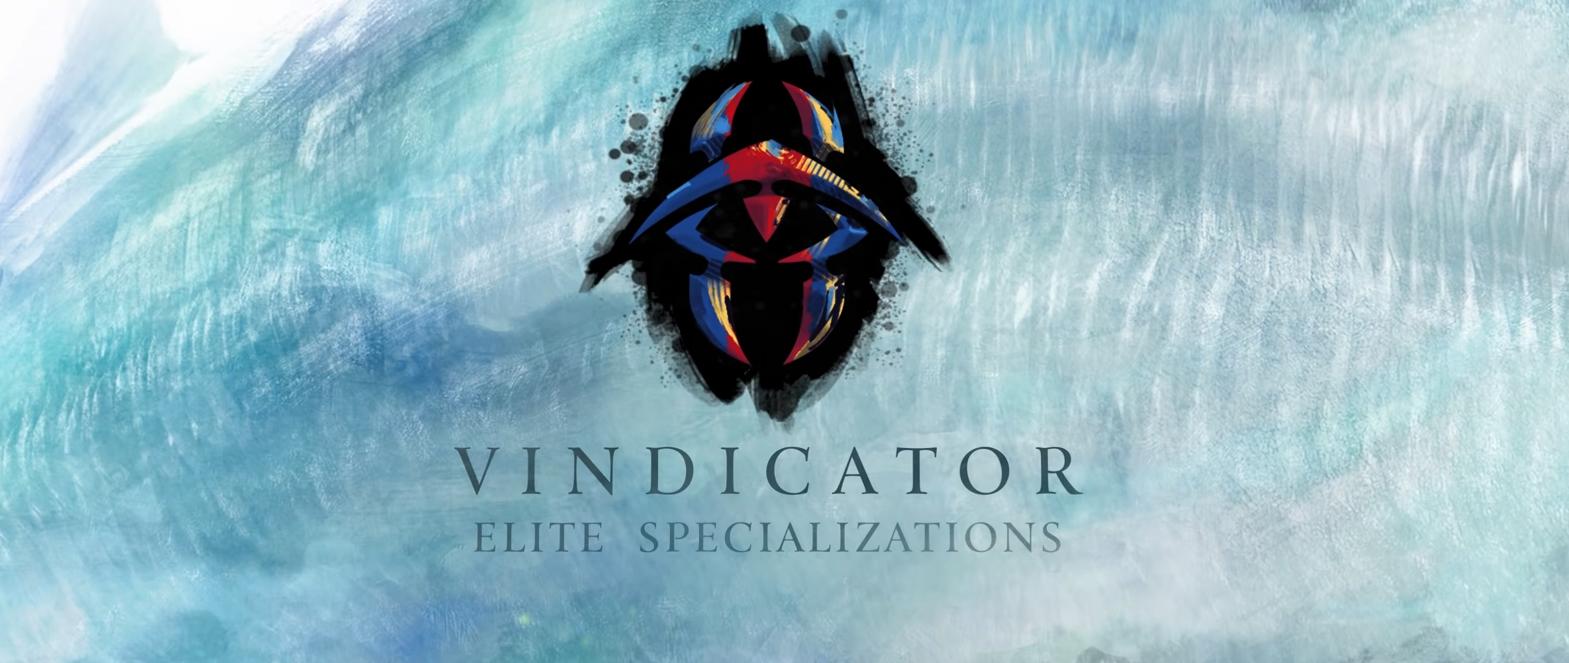 Guild Wars 2 Unveils The Vindicator Elite Specialization